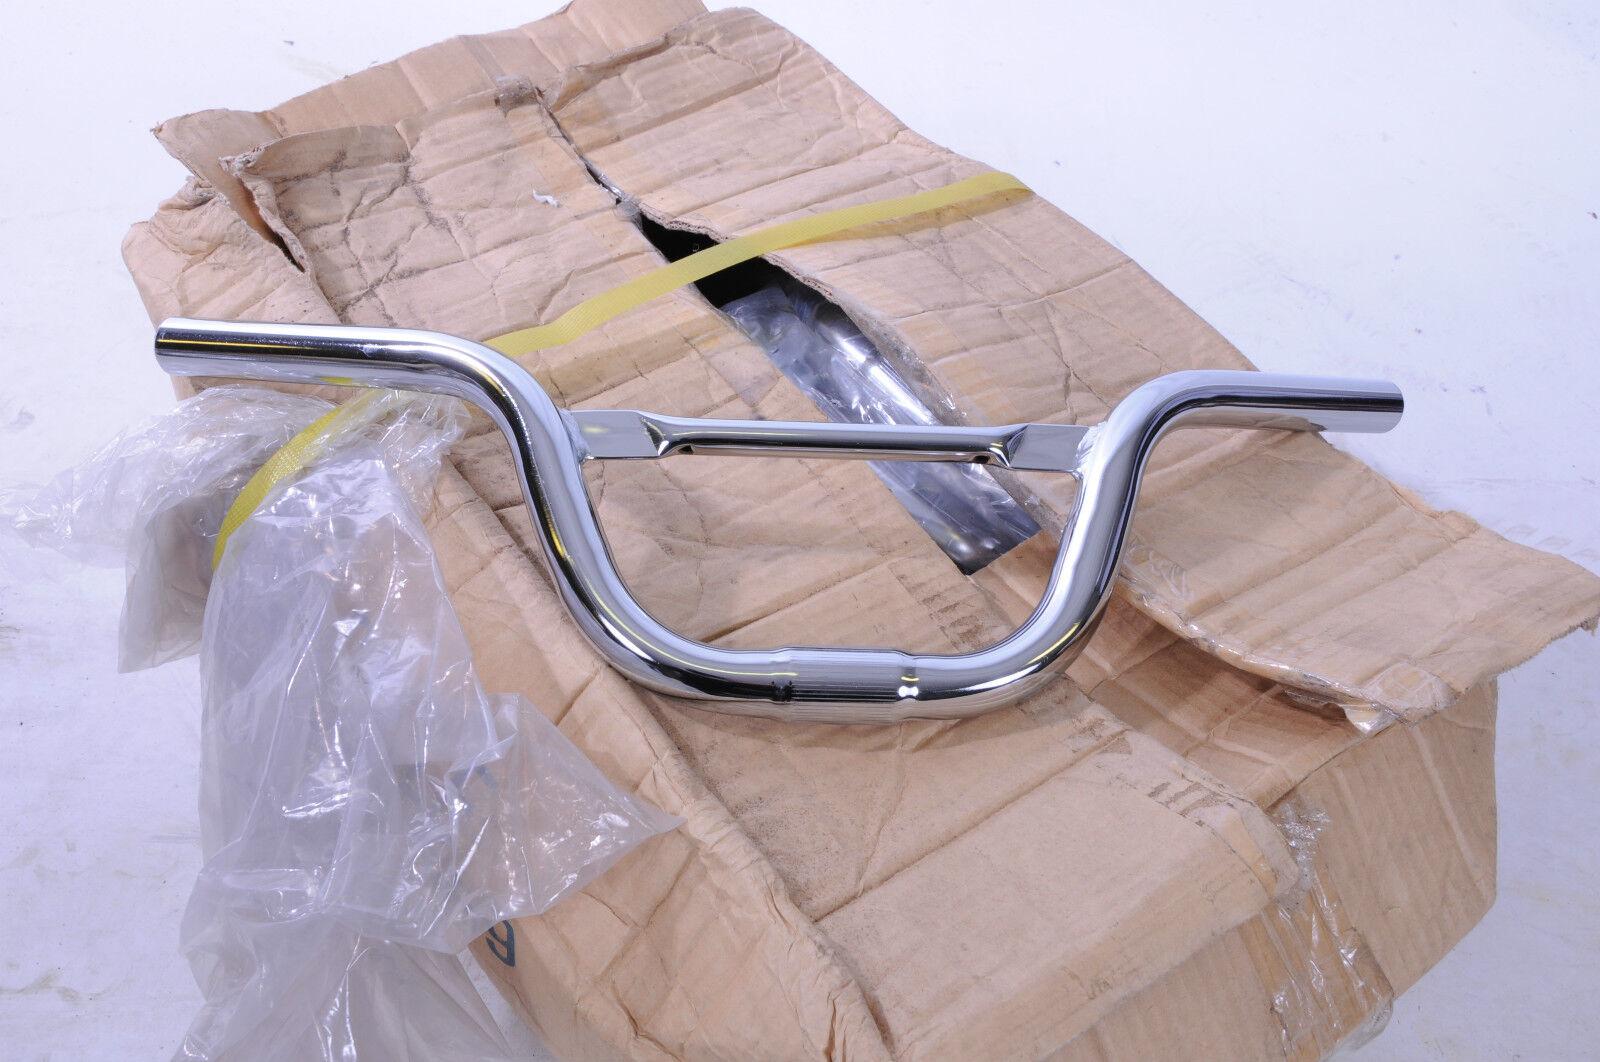 LOTTO all'Ingrosso Job 25x Bicicletta BMX Manubrio 470mm CROMATO CICLO MANUBRIO nn.